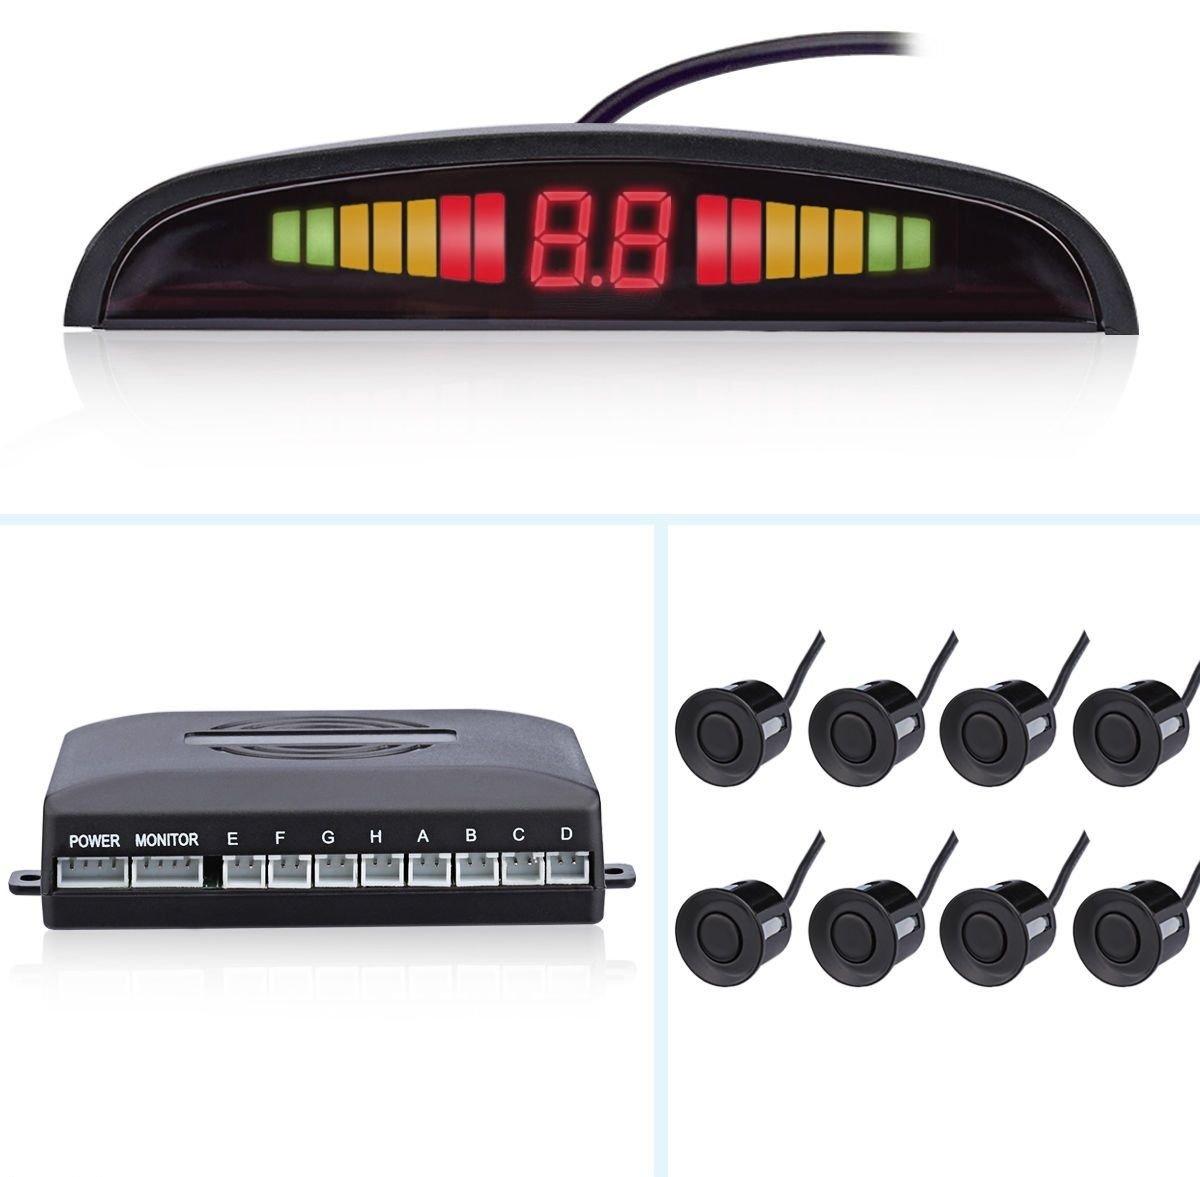 Car Parking Reverse Reversing Backup Radar System with 8 Parking Sensor Front 4 Rear 4 Kit LED Display - Black AUTOMATE®